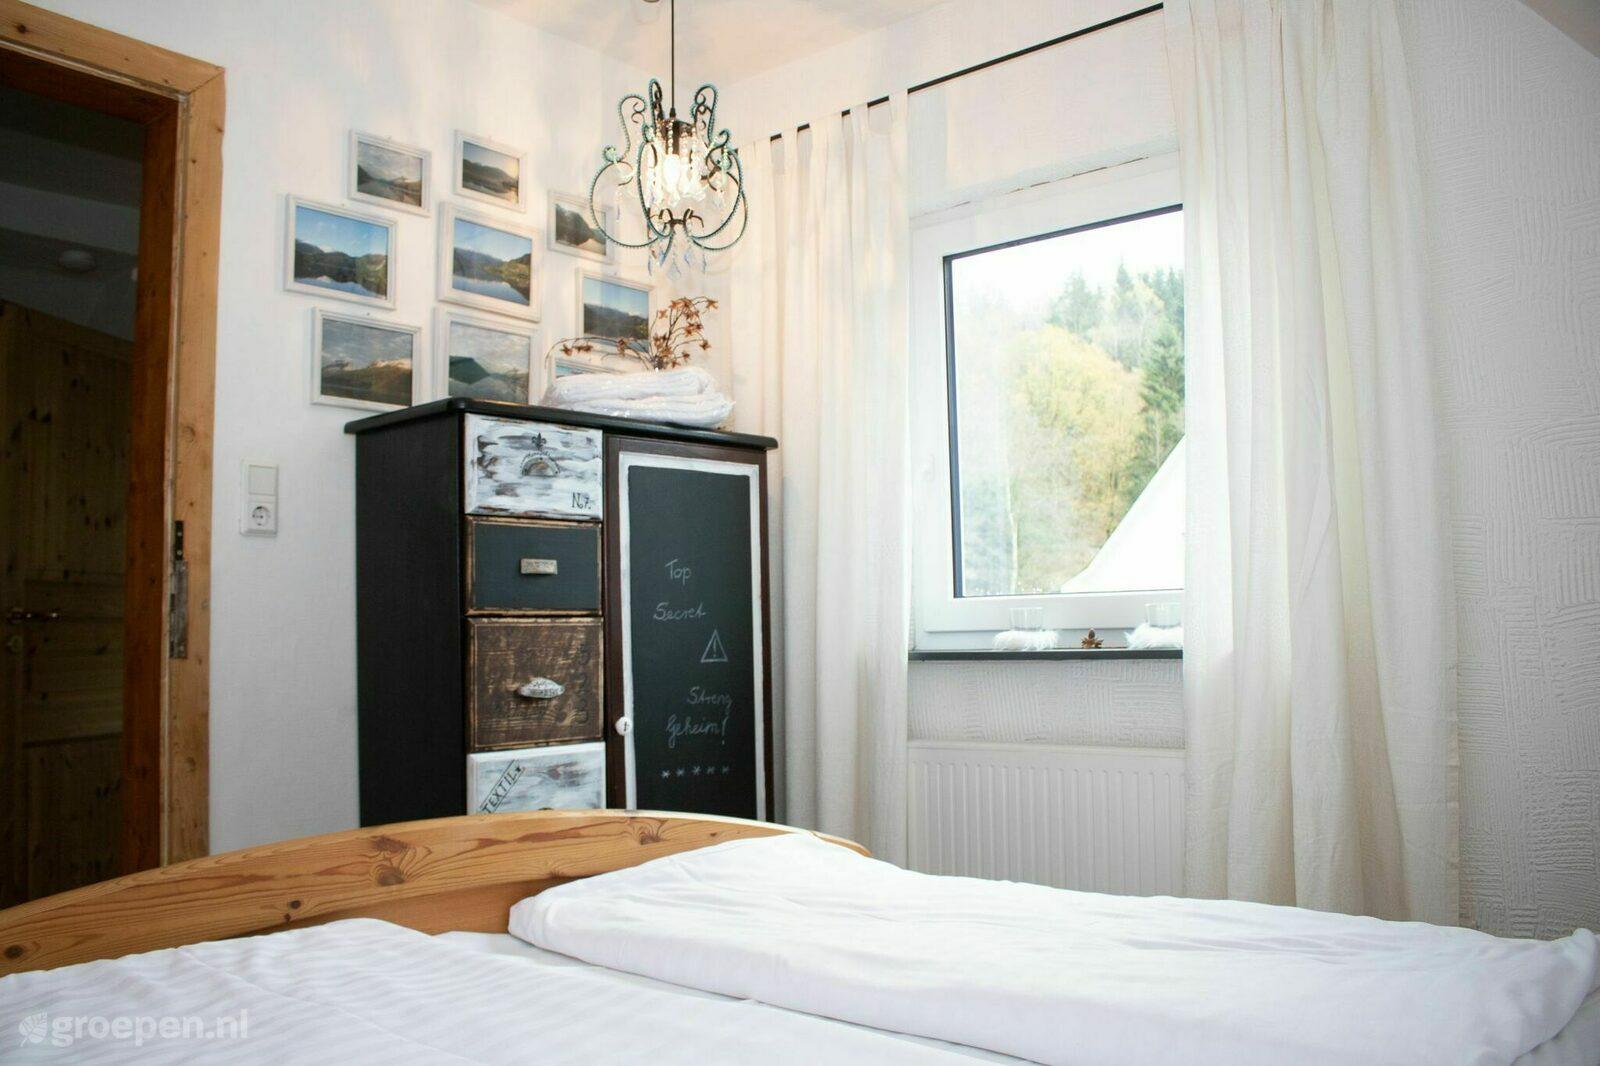 Vakantiehuis Silbach